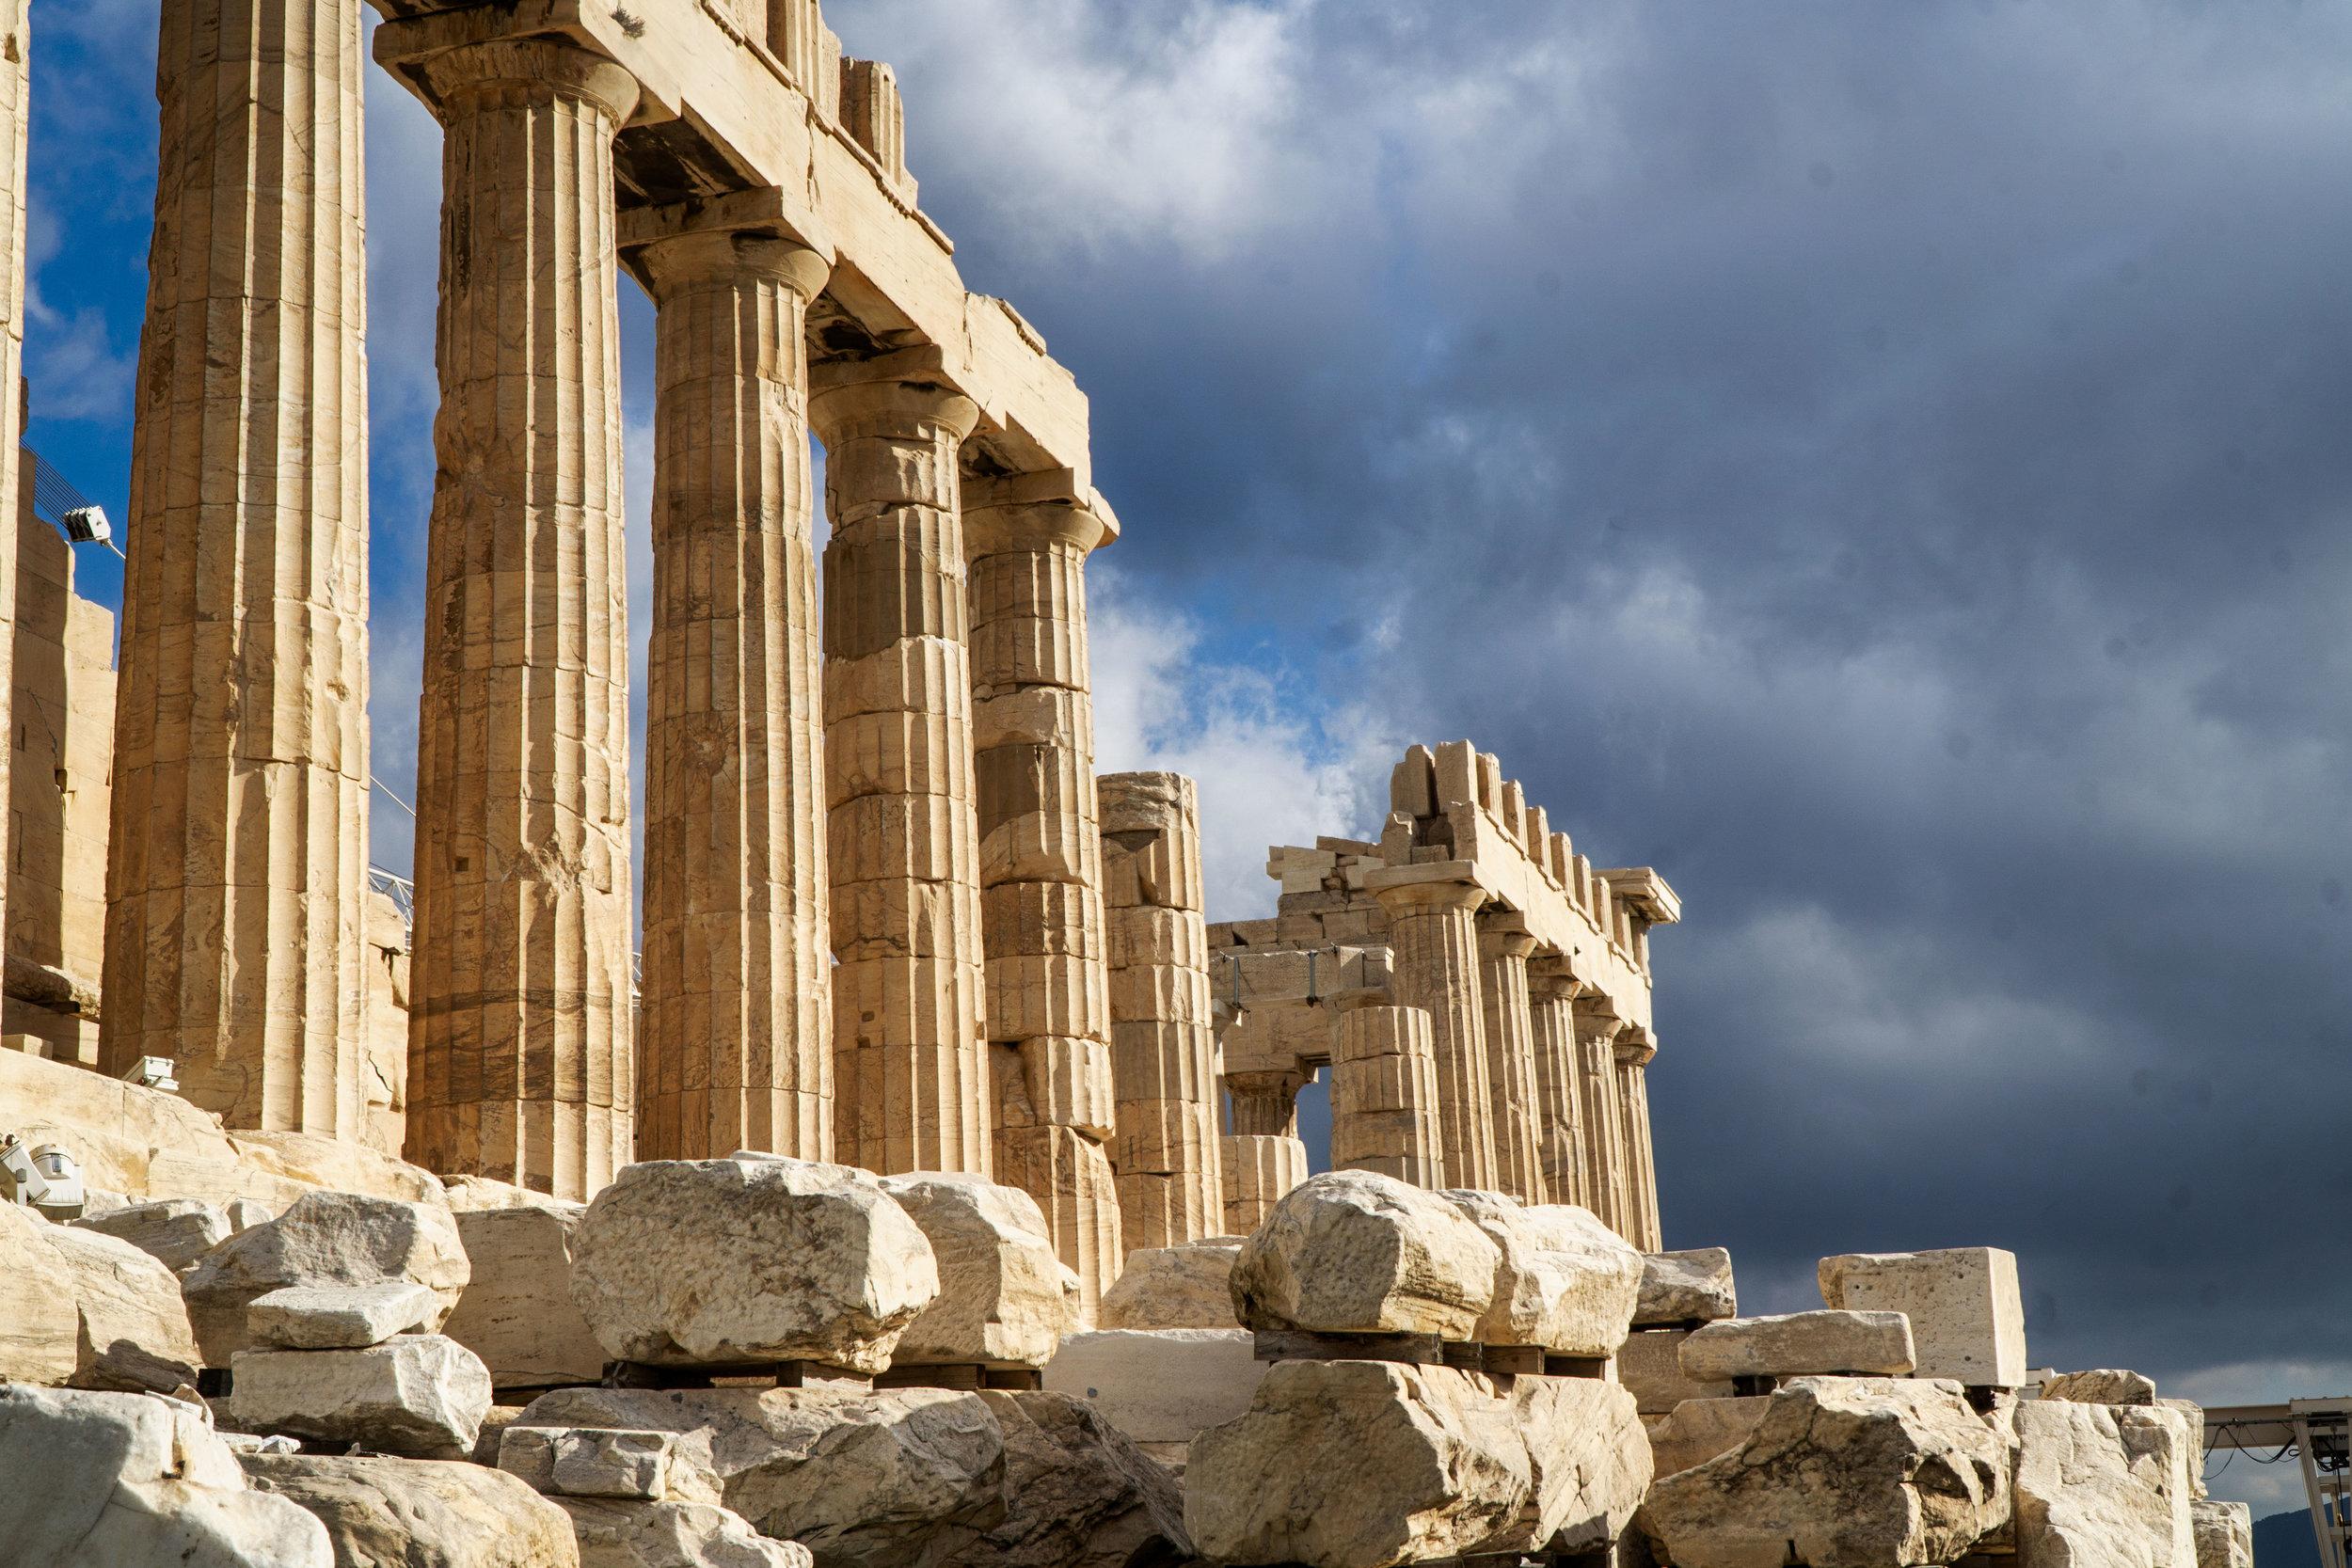 athens_acropolis_vickygood_travel_photography8sm.jpg